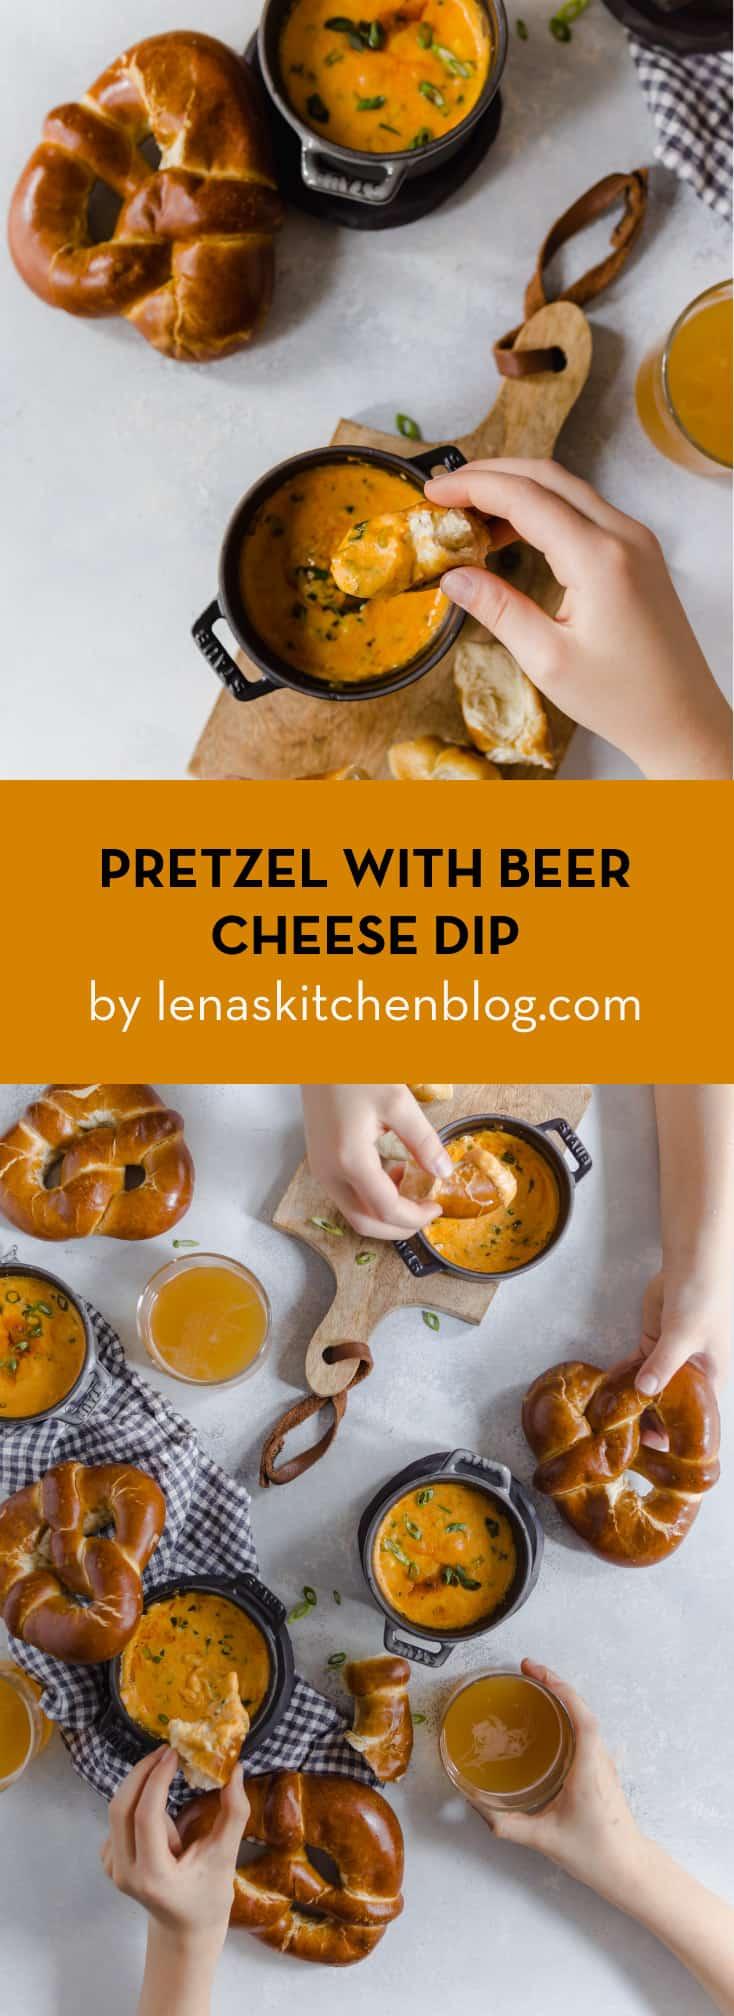 PRETZEL WITH BEER CHEESE